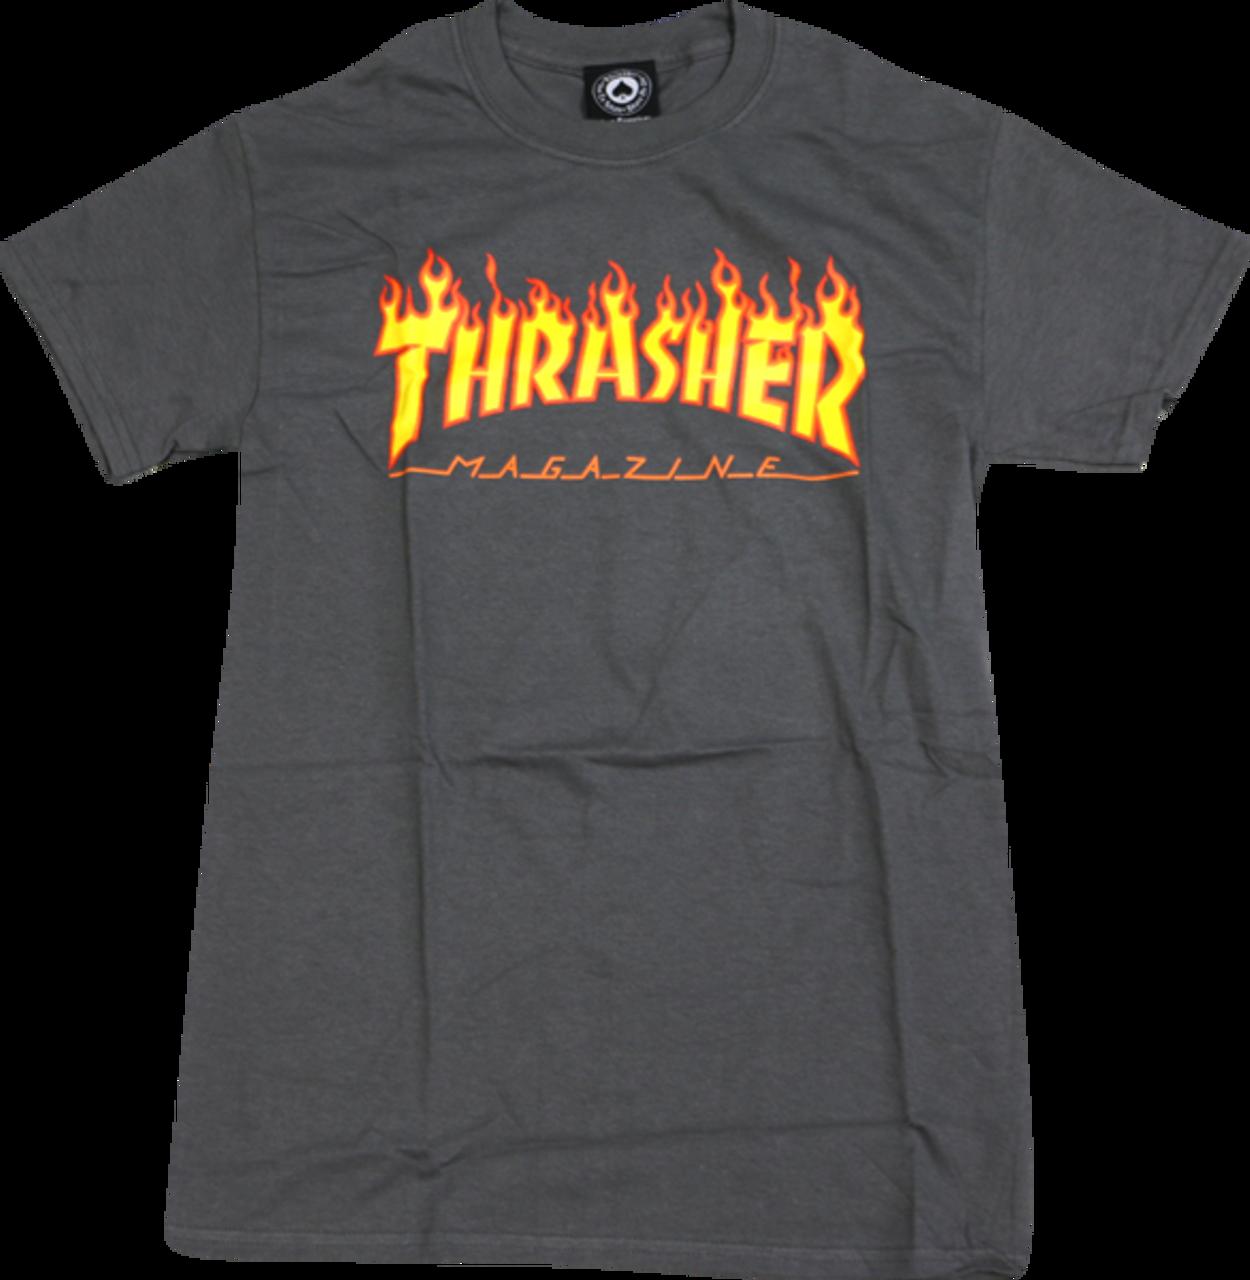 cfdbf35128c2 Chargement Source · THRASHER FLAME T Shirt Charcoal